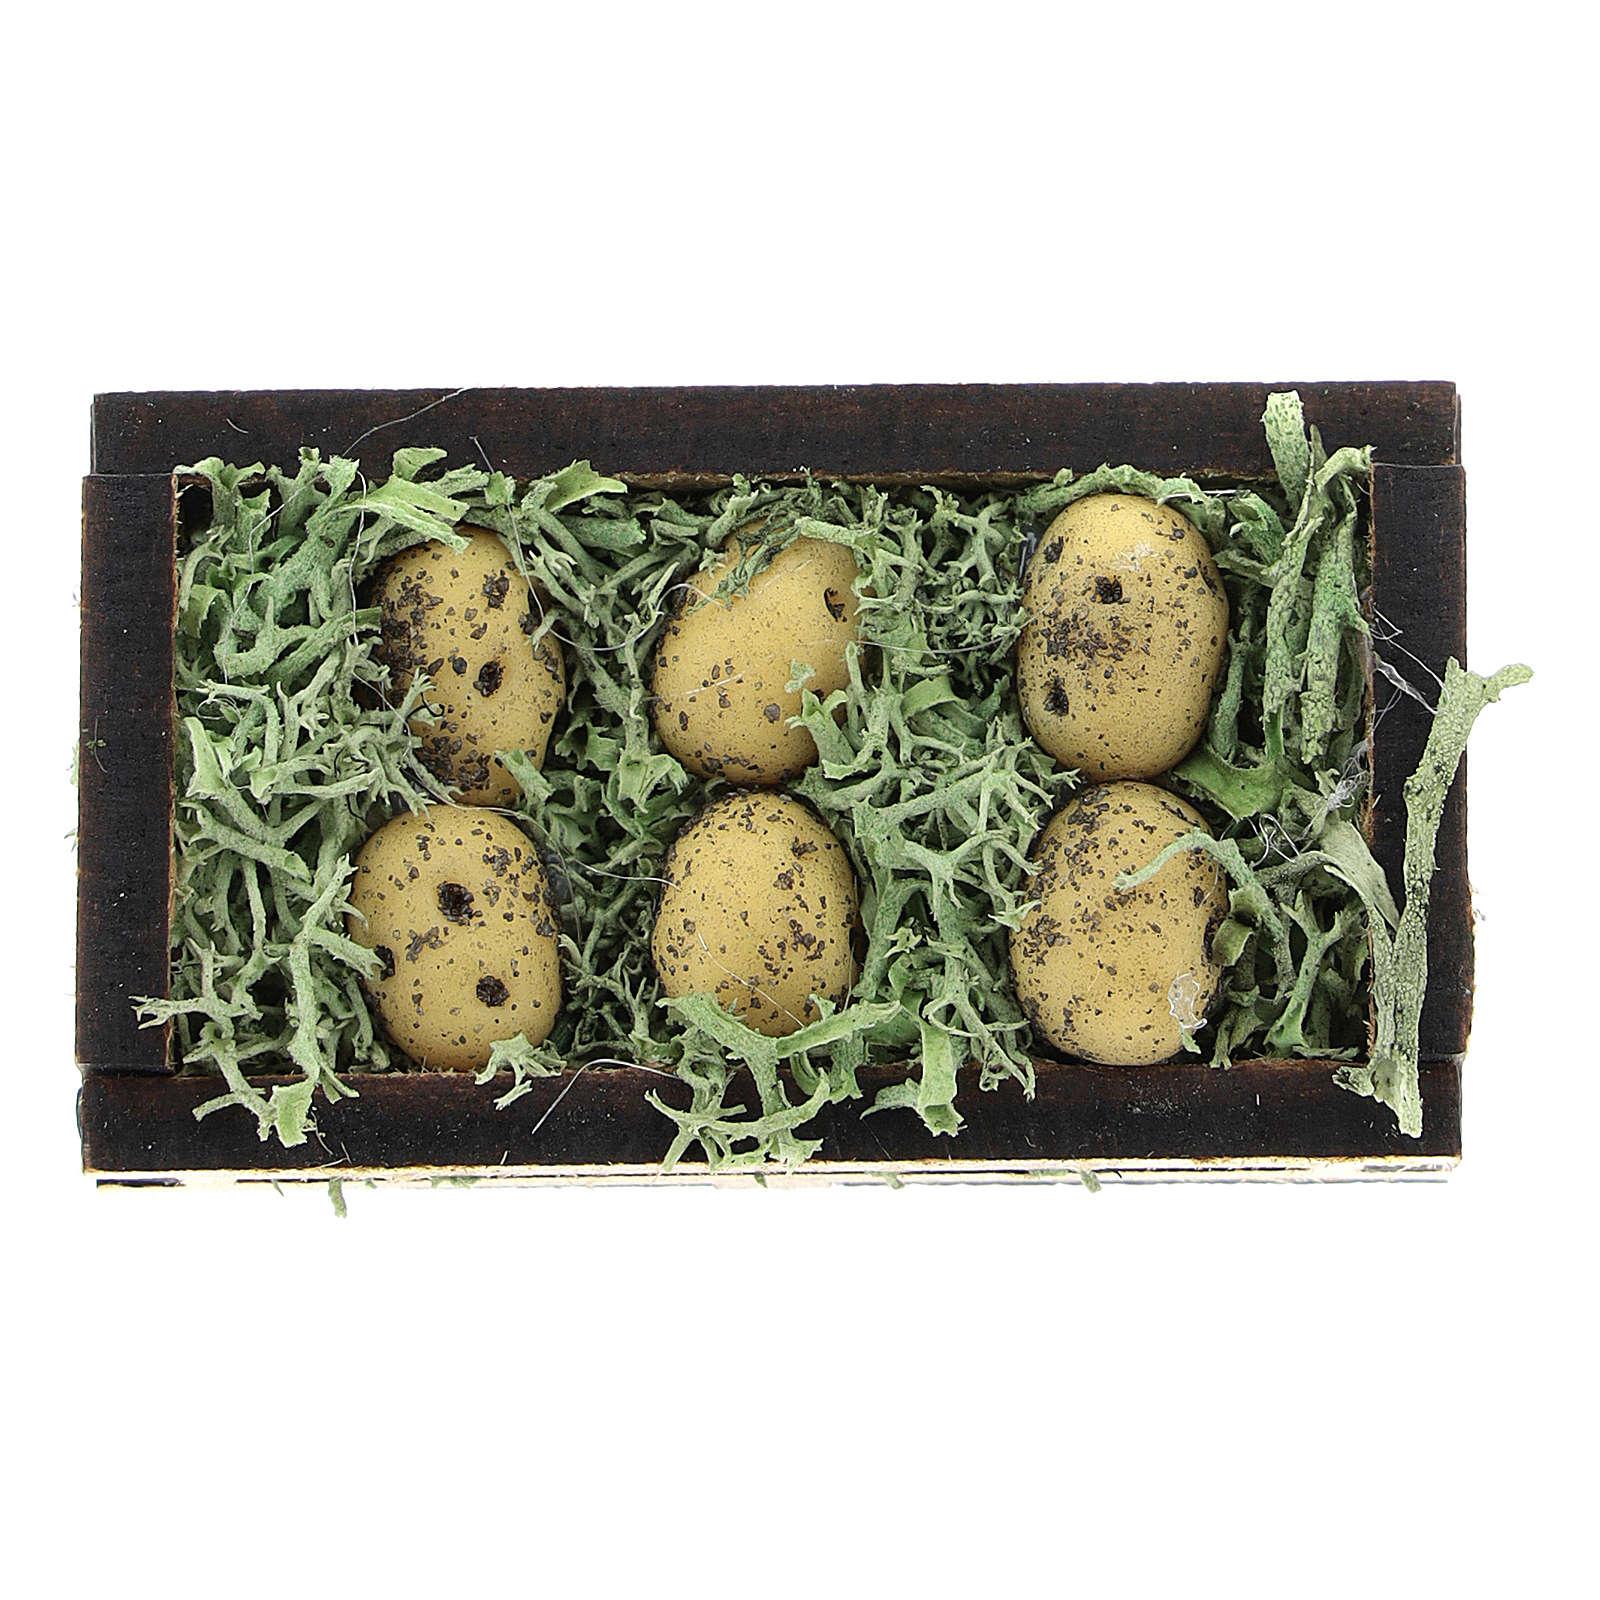 Caja patatas belén de madera y resina 4 cm 4